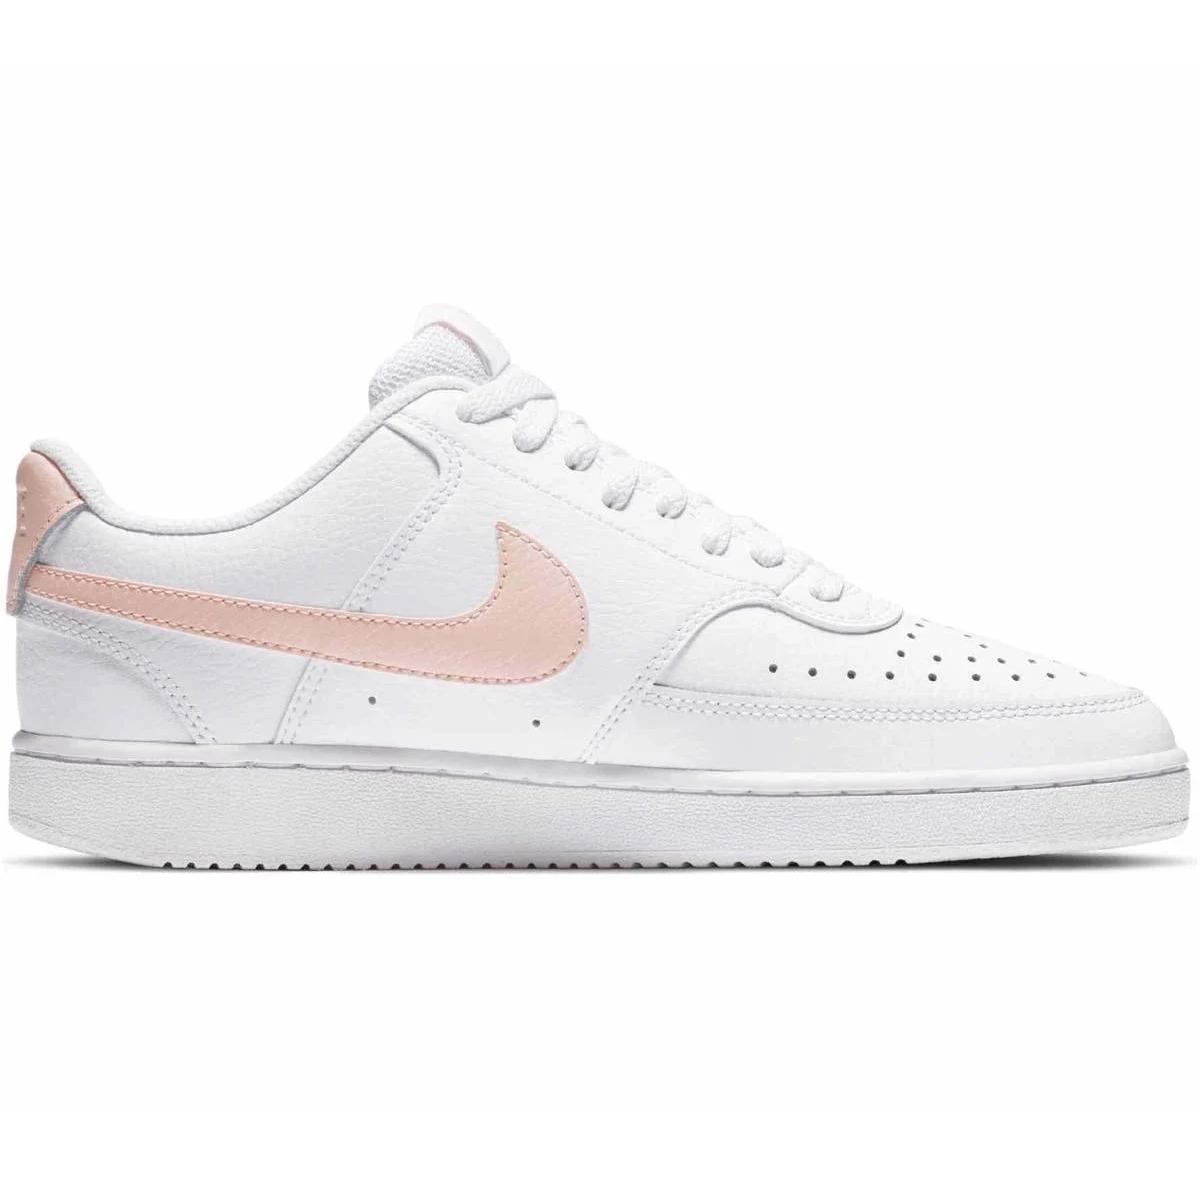 Nike Court Vision Low Sneaker Damen weiß coral